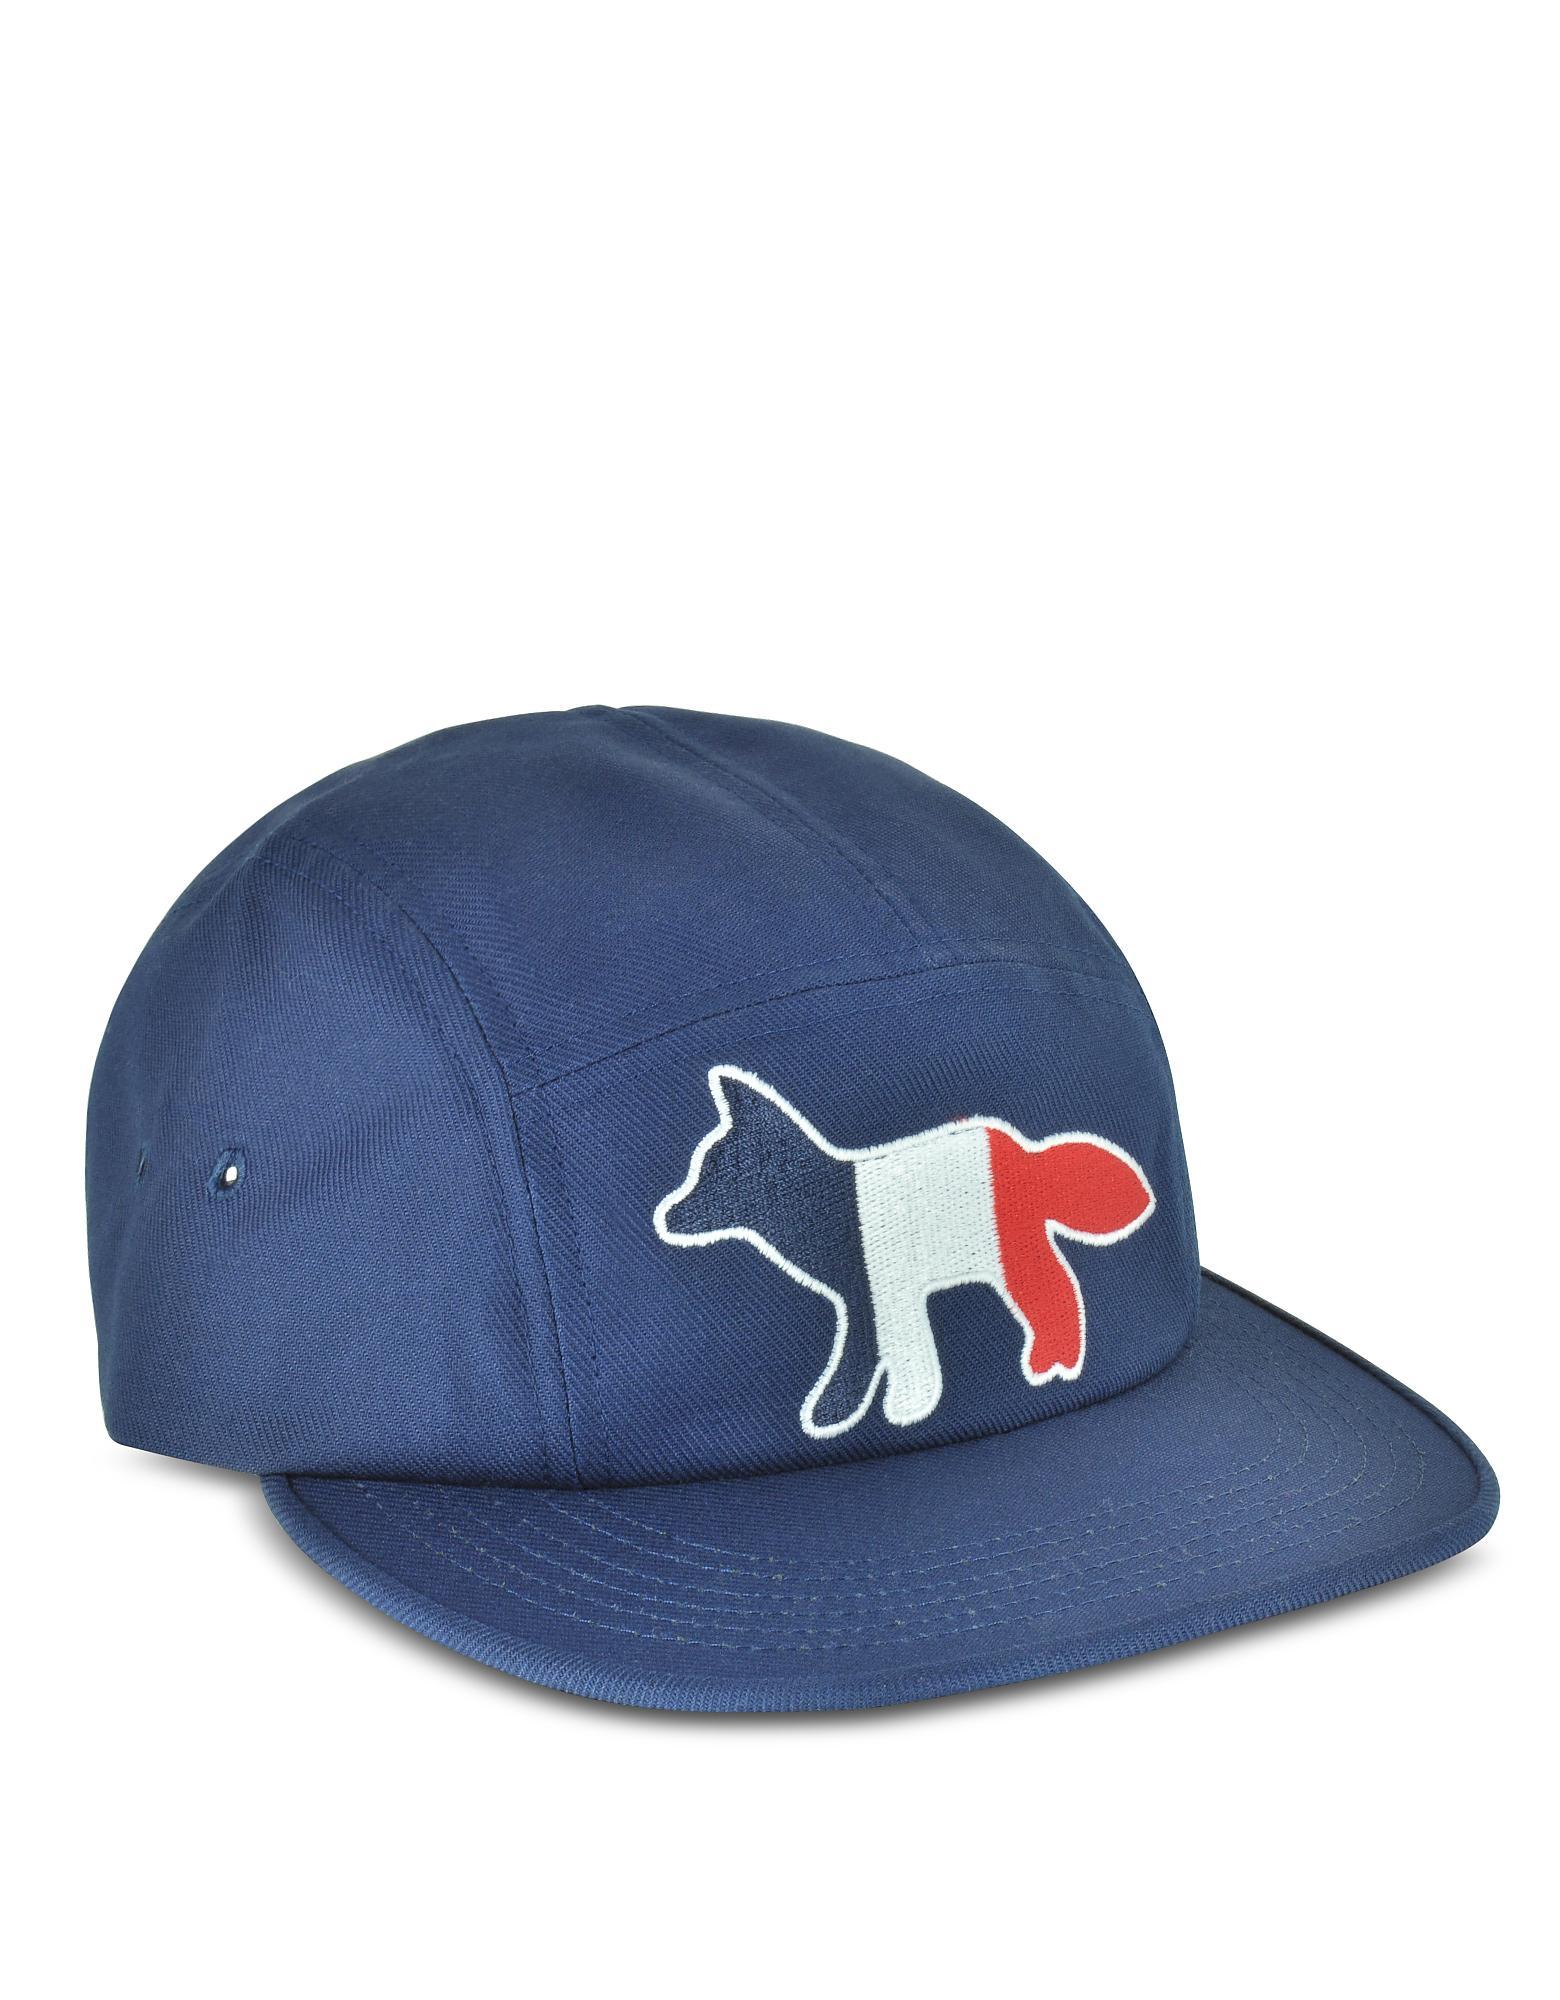 Casquette Baseball Logo Coton Avec En Marine Mélangé Bleu De 9EH2IYWD